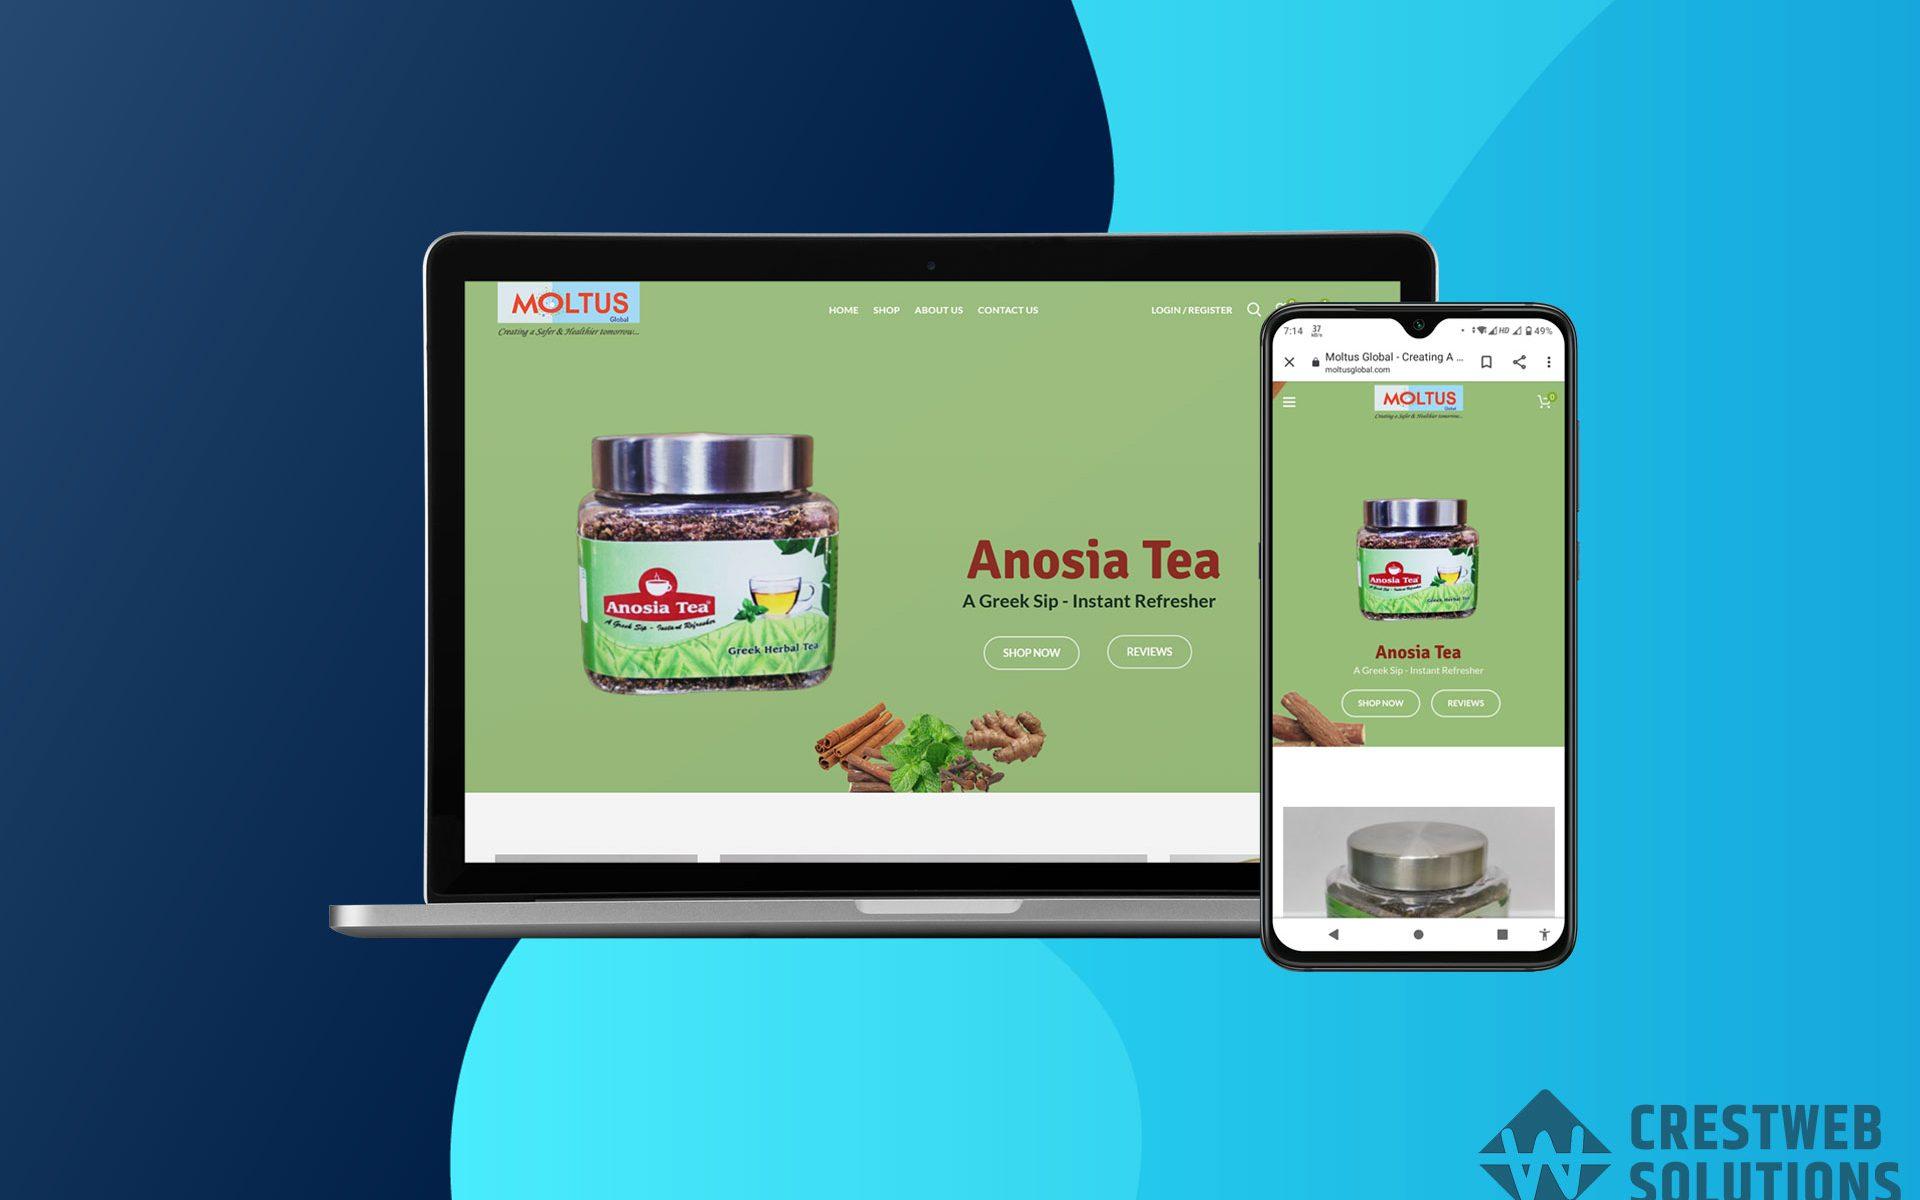 moltus global respionsive website in mumbai ecommerce crestweb solutions